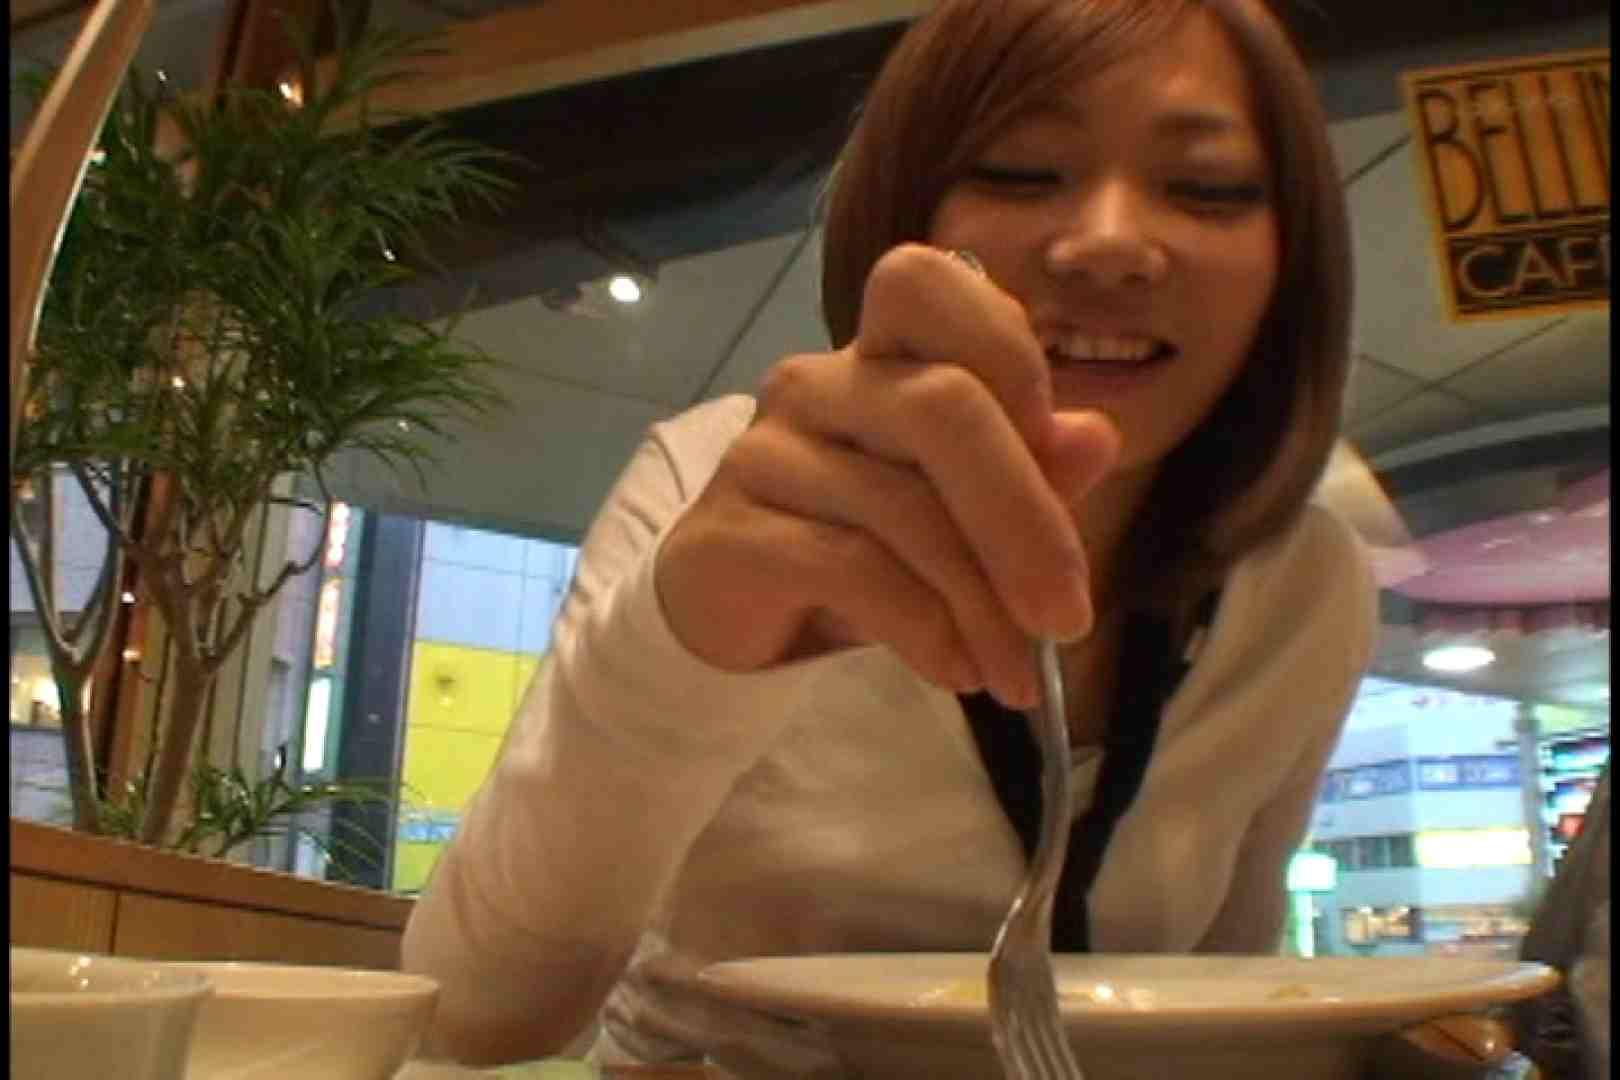 JDハンター全国ツアー vol.036 前編 女子大生のエロ動画 | 0  85PIX 33